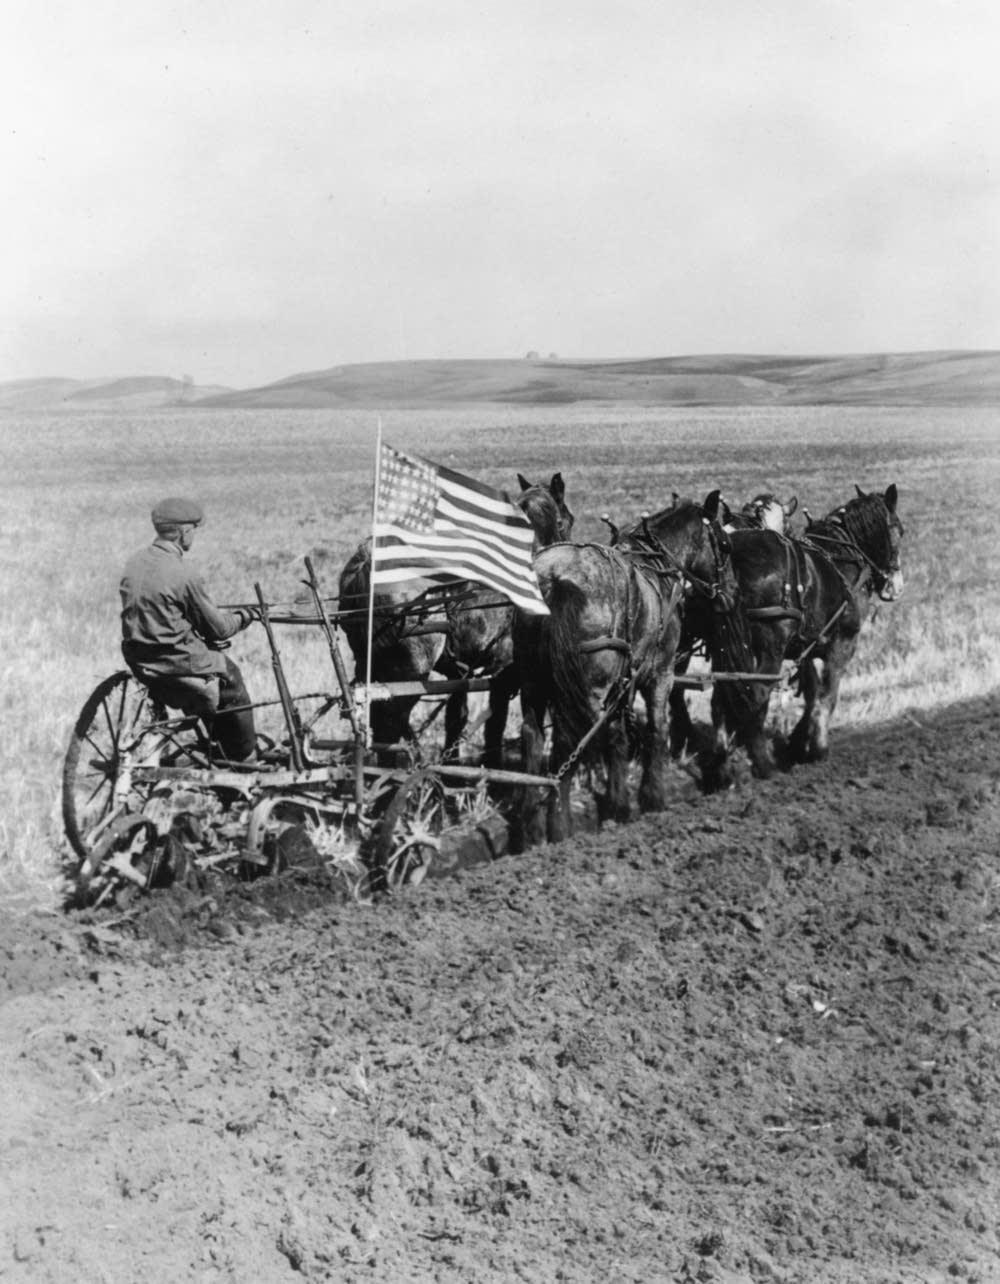 Patriotic farmer, 1910s